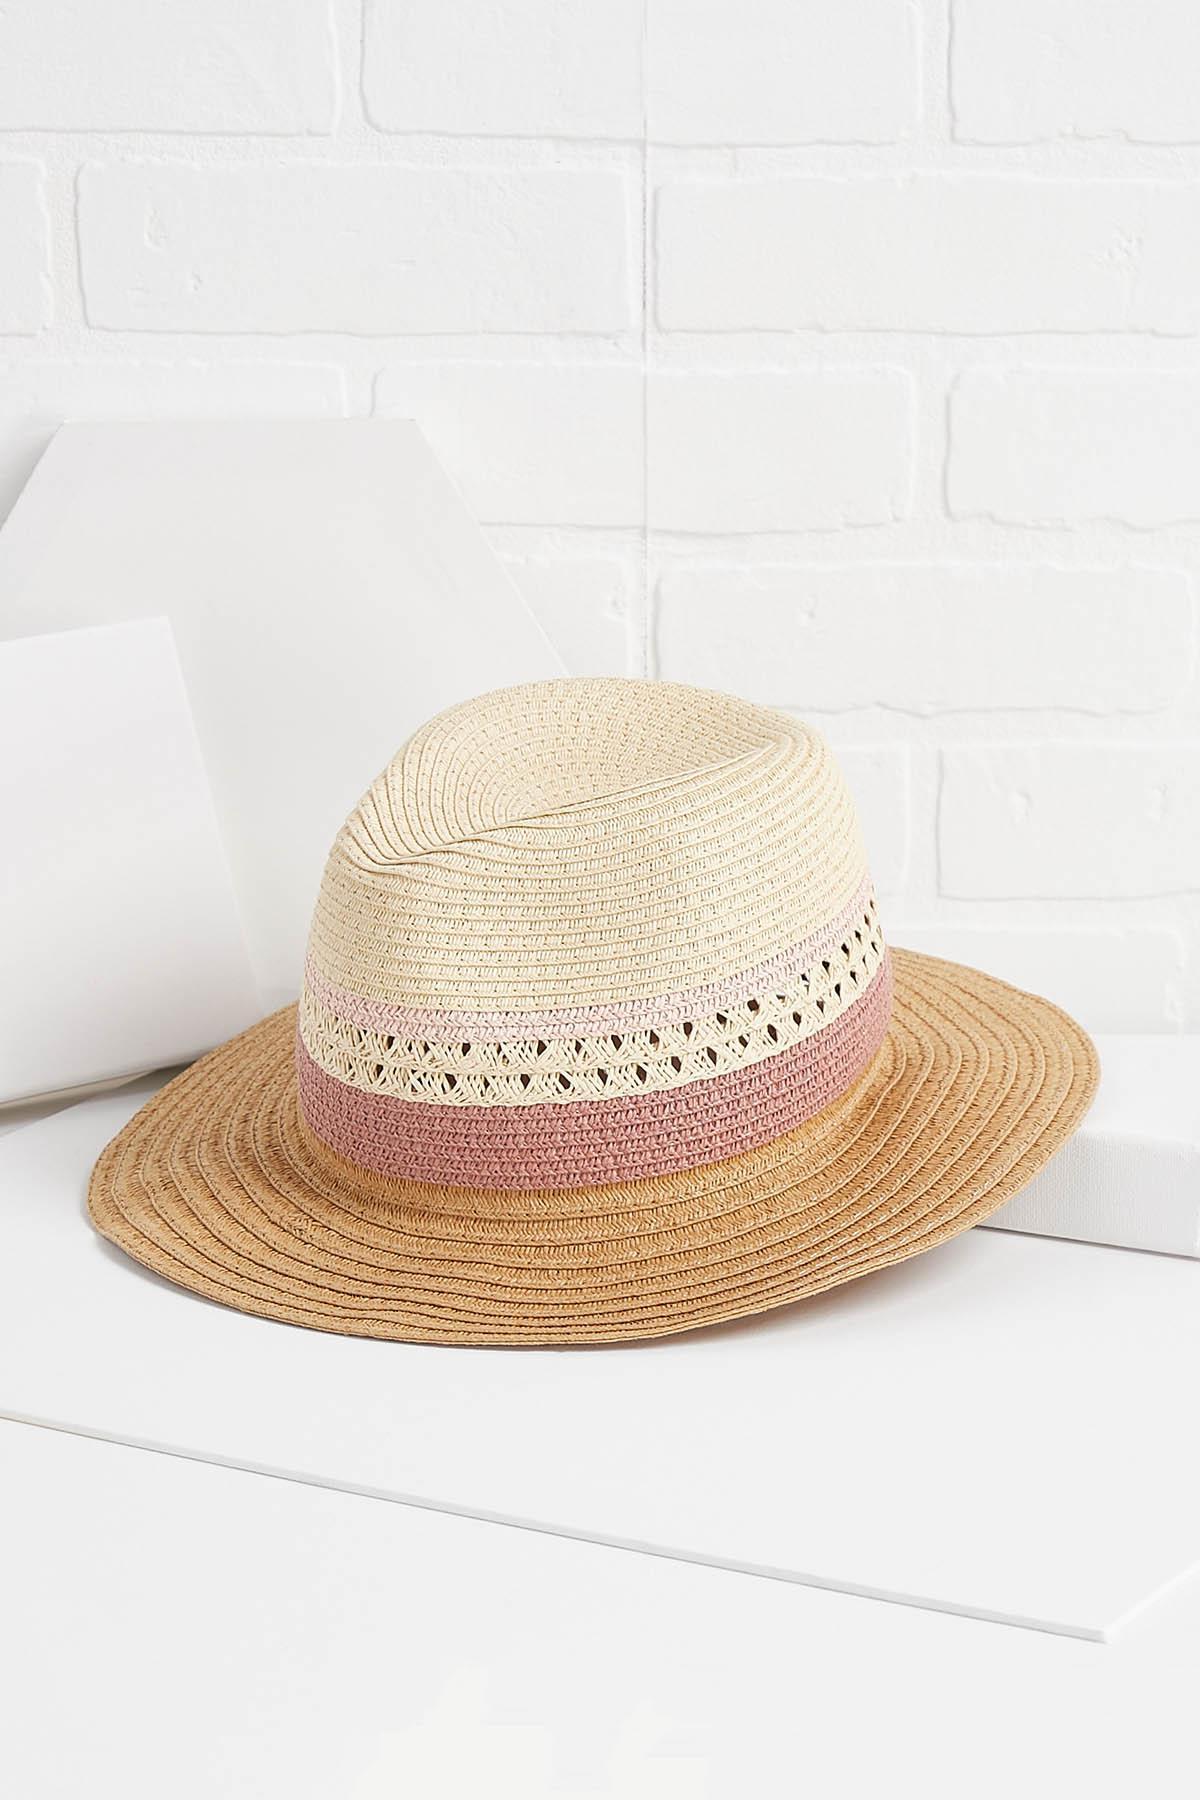 I Want It Straw Hat